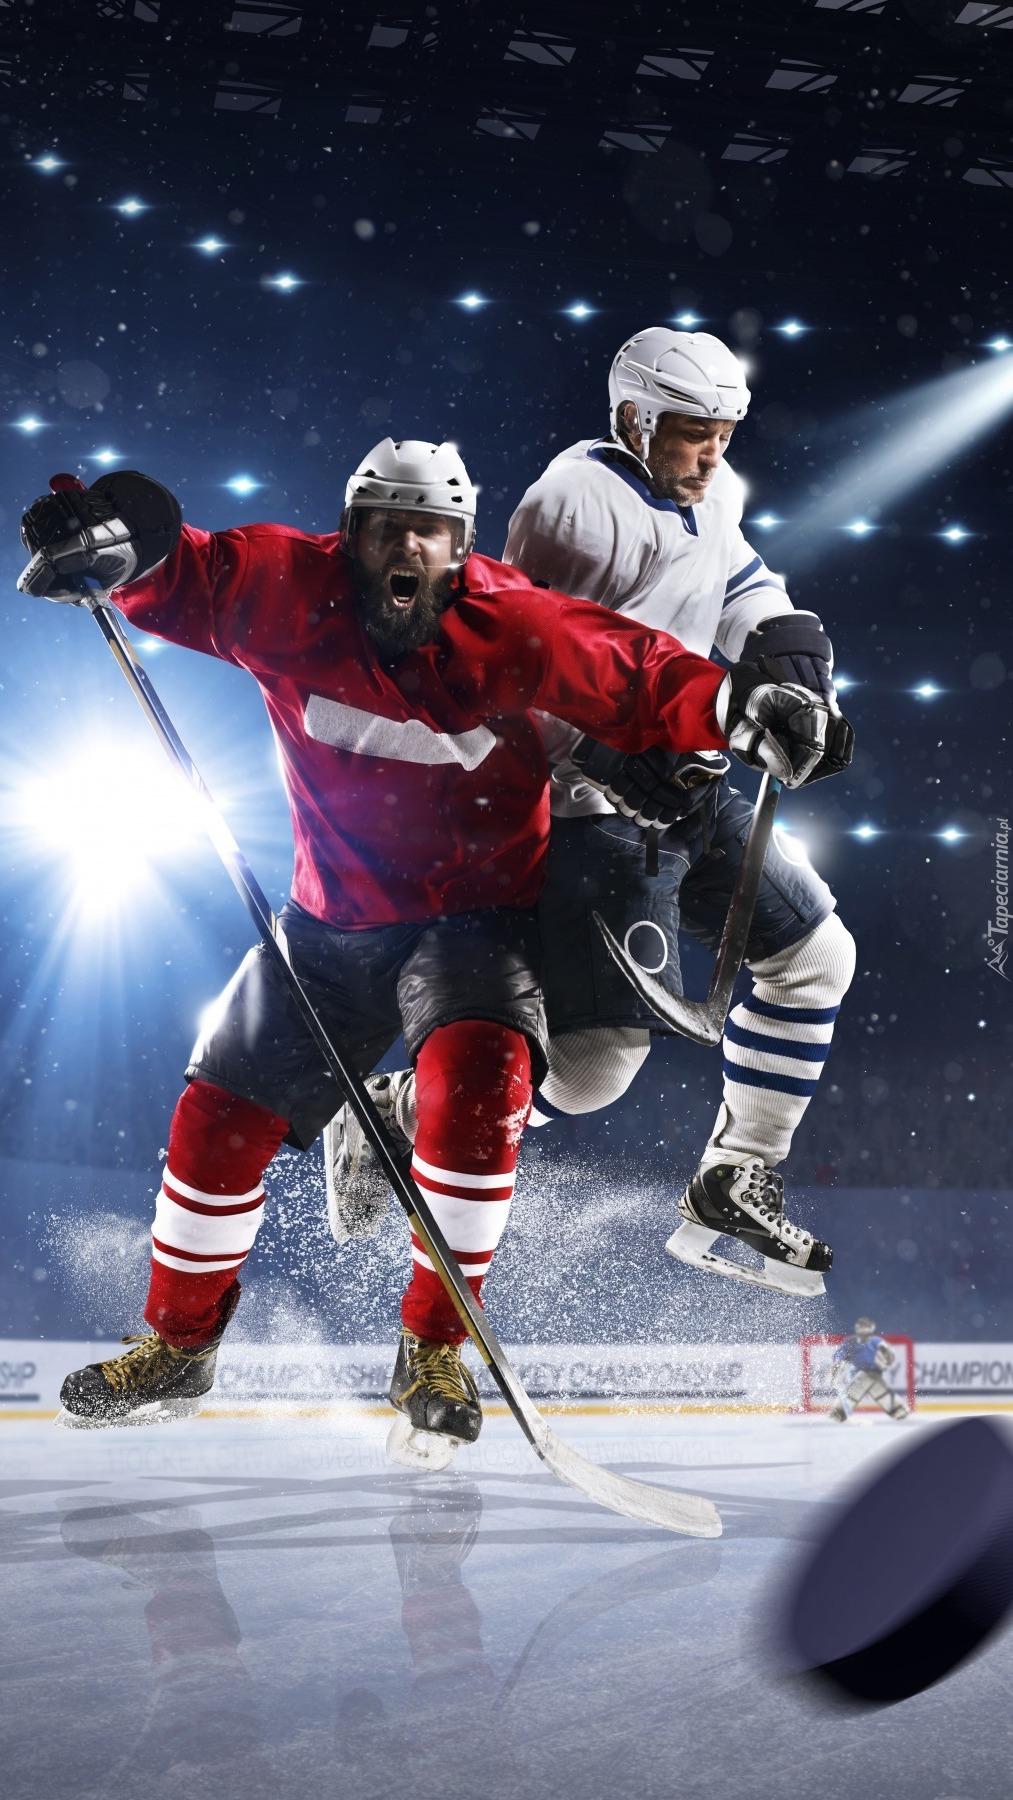 Zacięta walka o hokejowy krążek